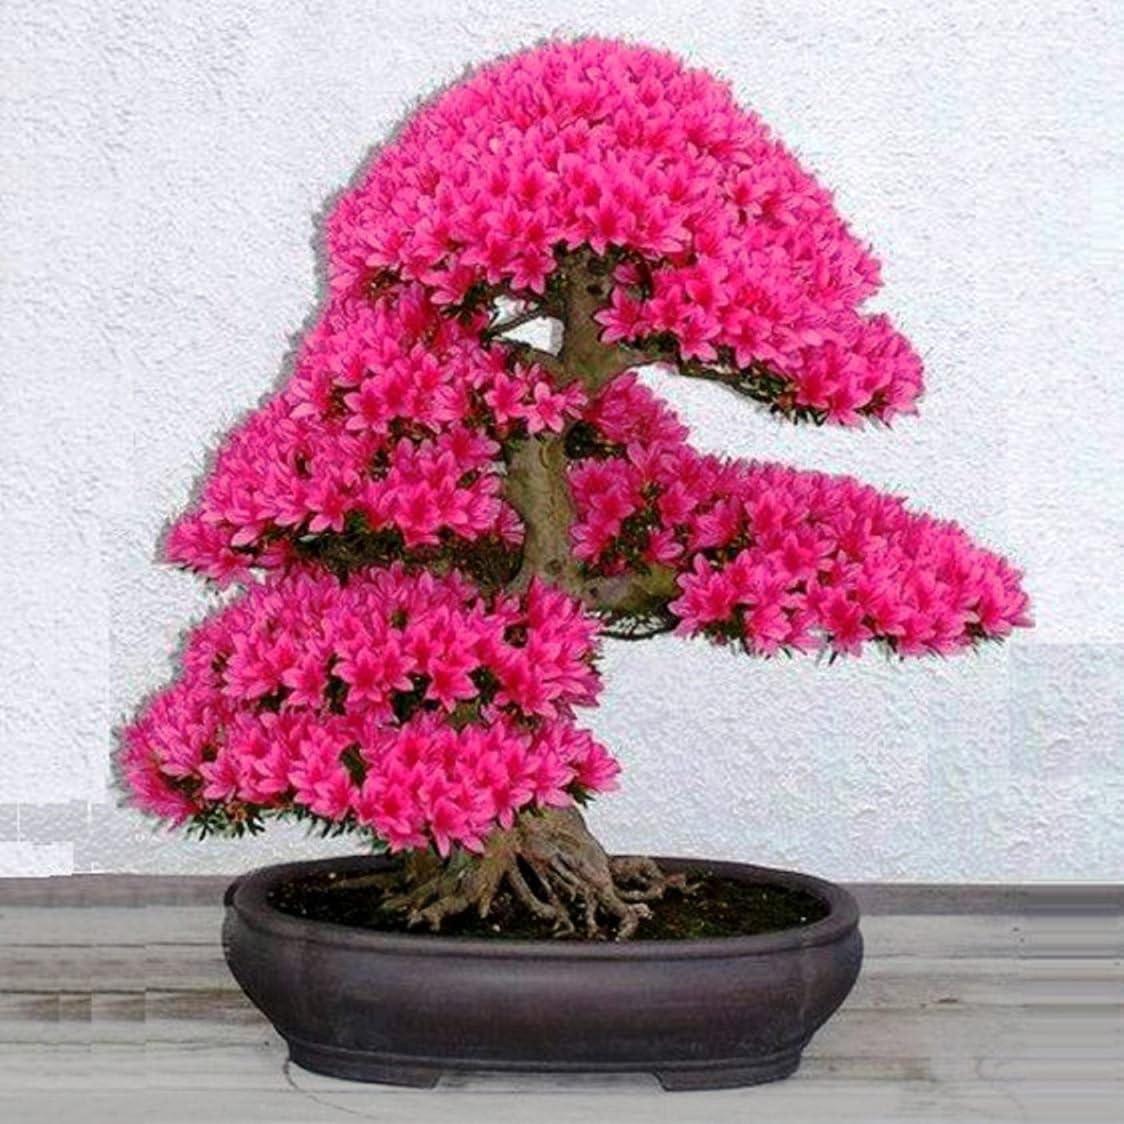 Bonsai Flower Seeds Cherry Blossoms Bonsai Tree Japanese Sakura Seeds 10pcs